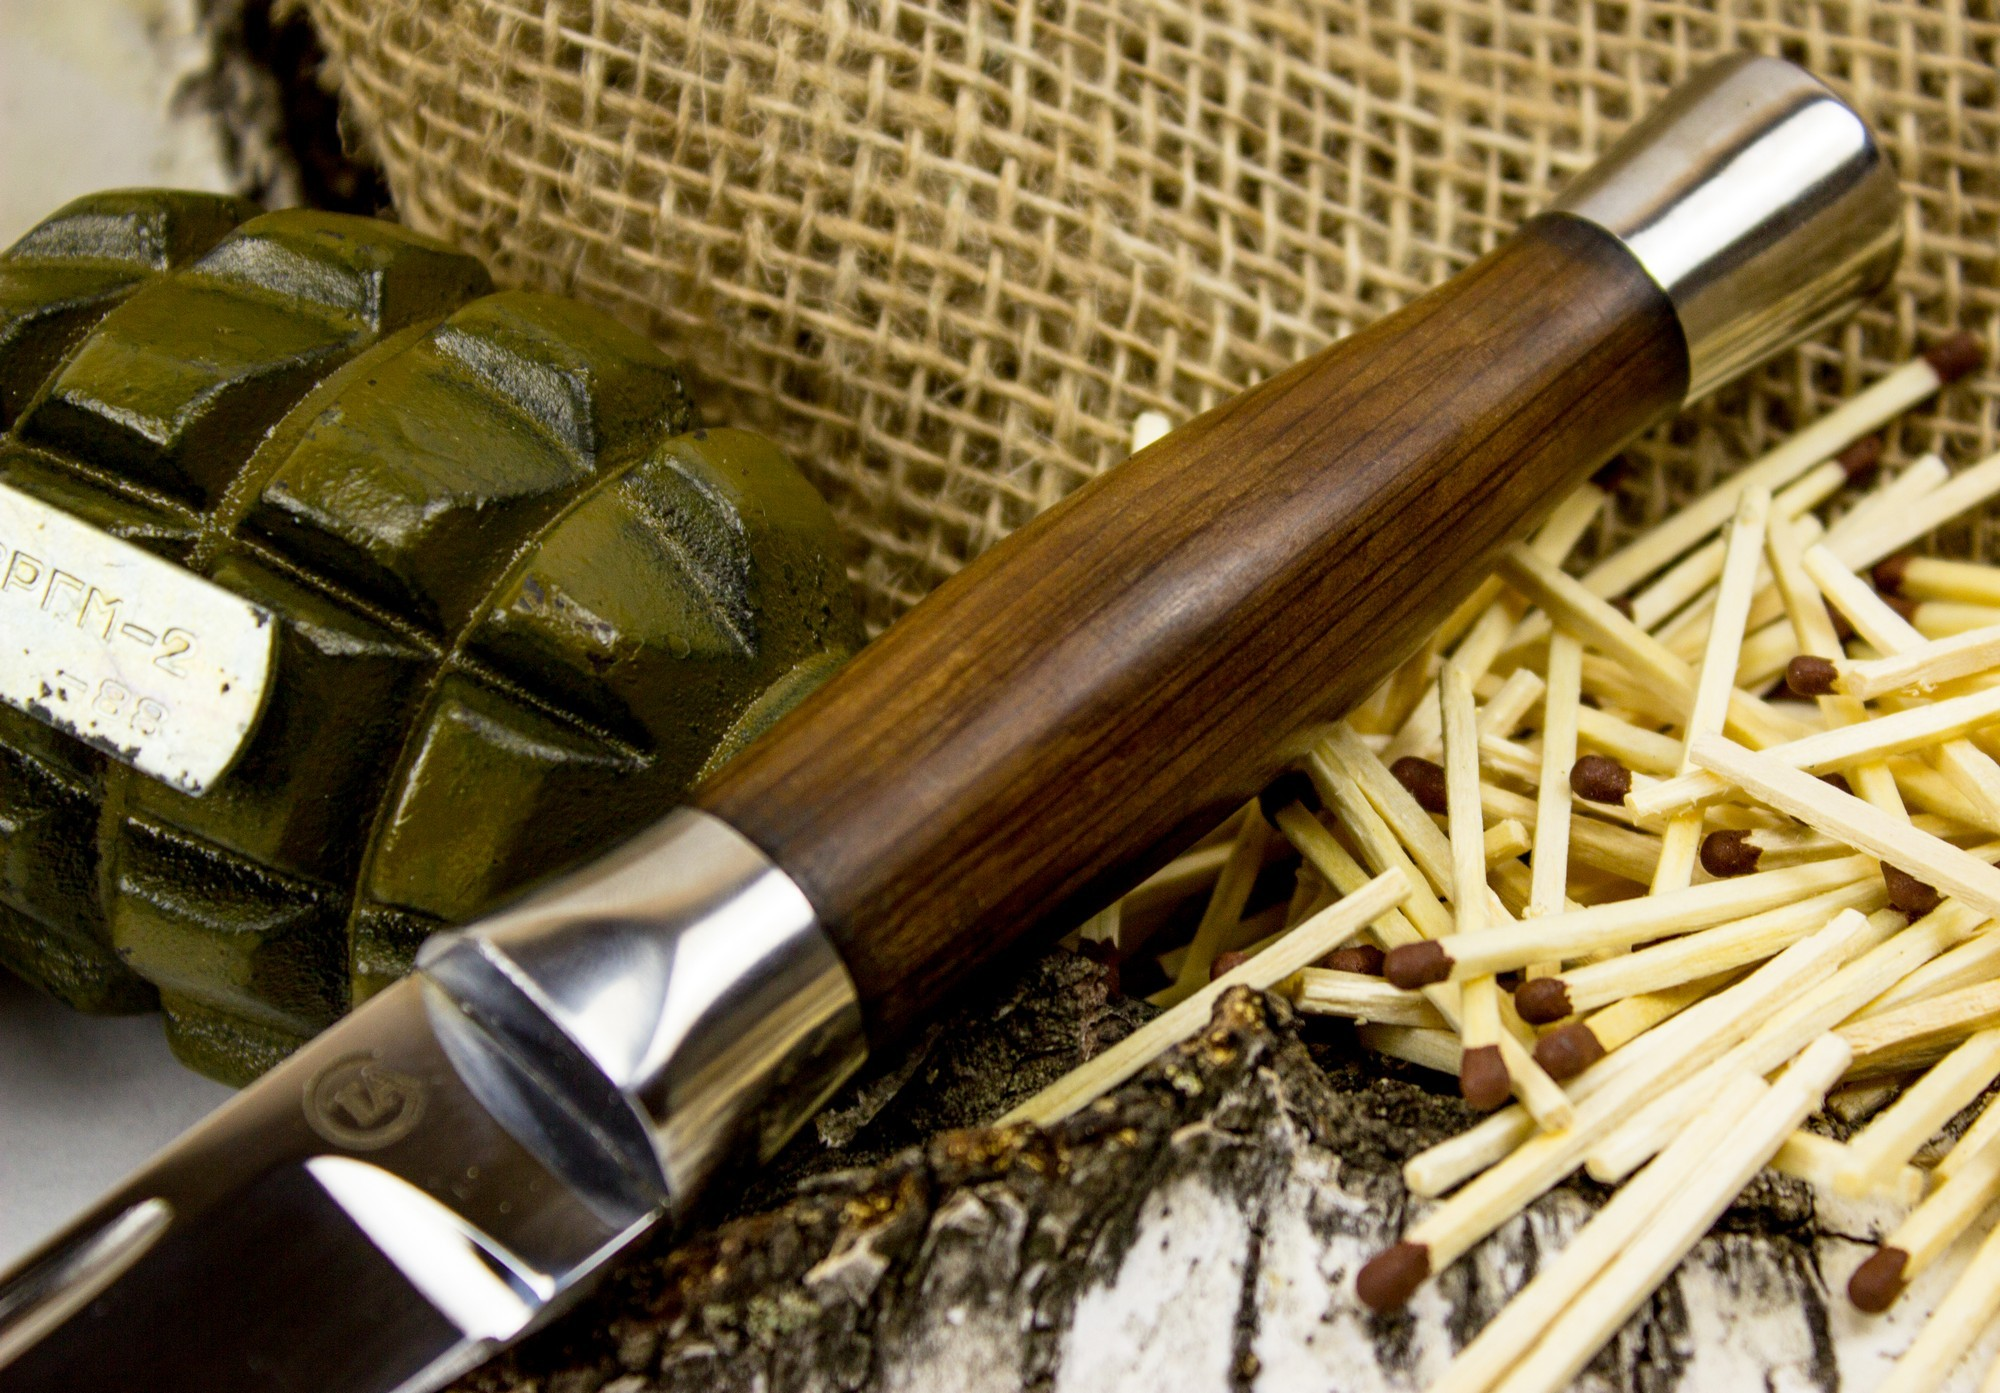 Фото 8 - Нож Горец-3М, сталь 95х18 от Титов и Солдатова